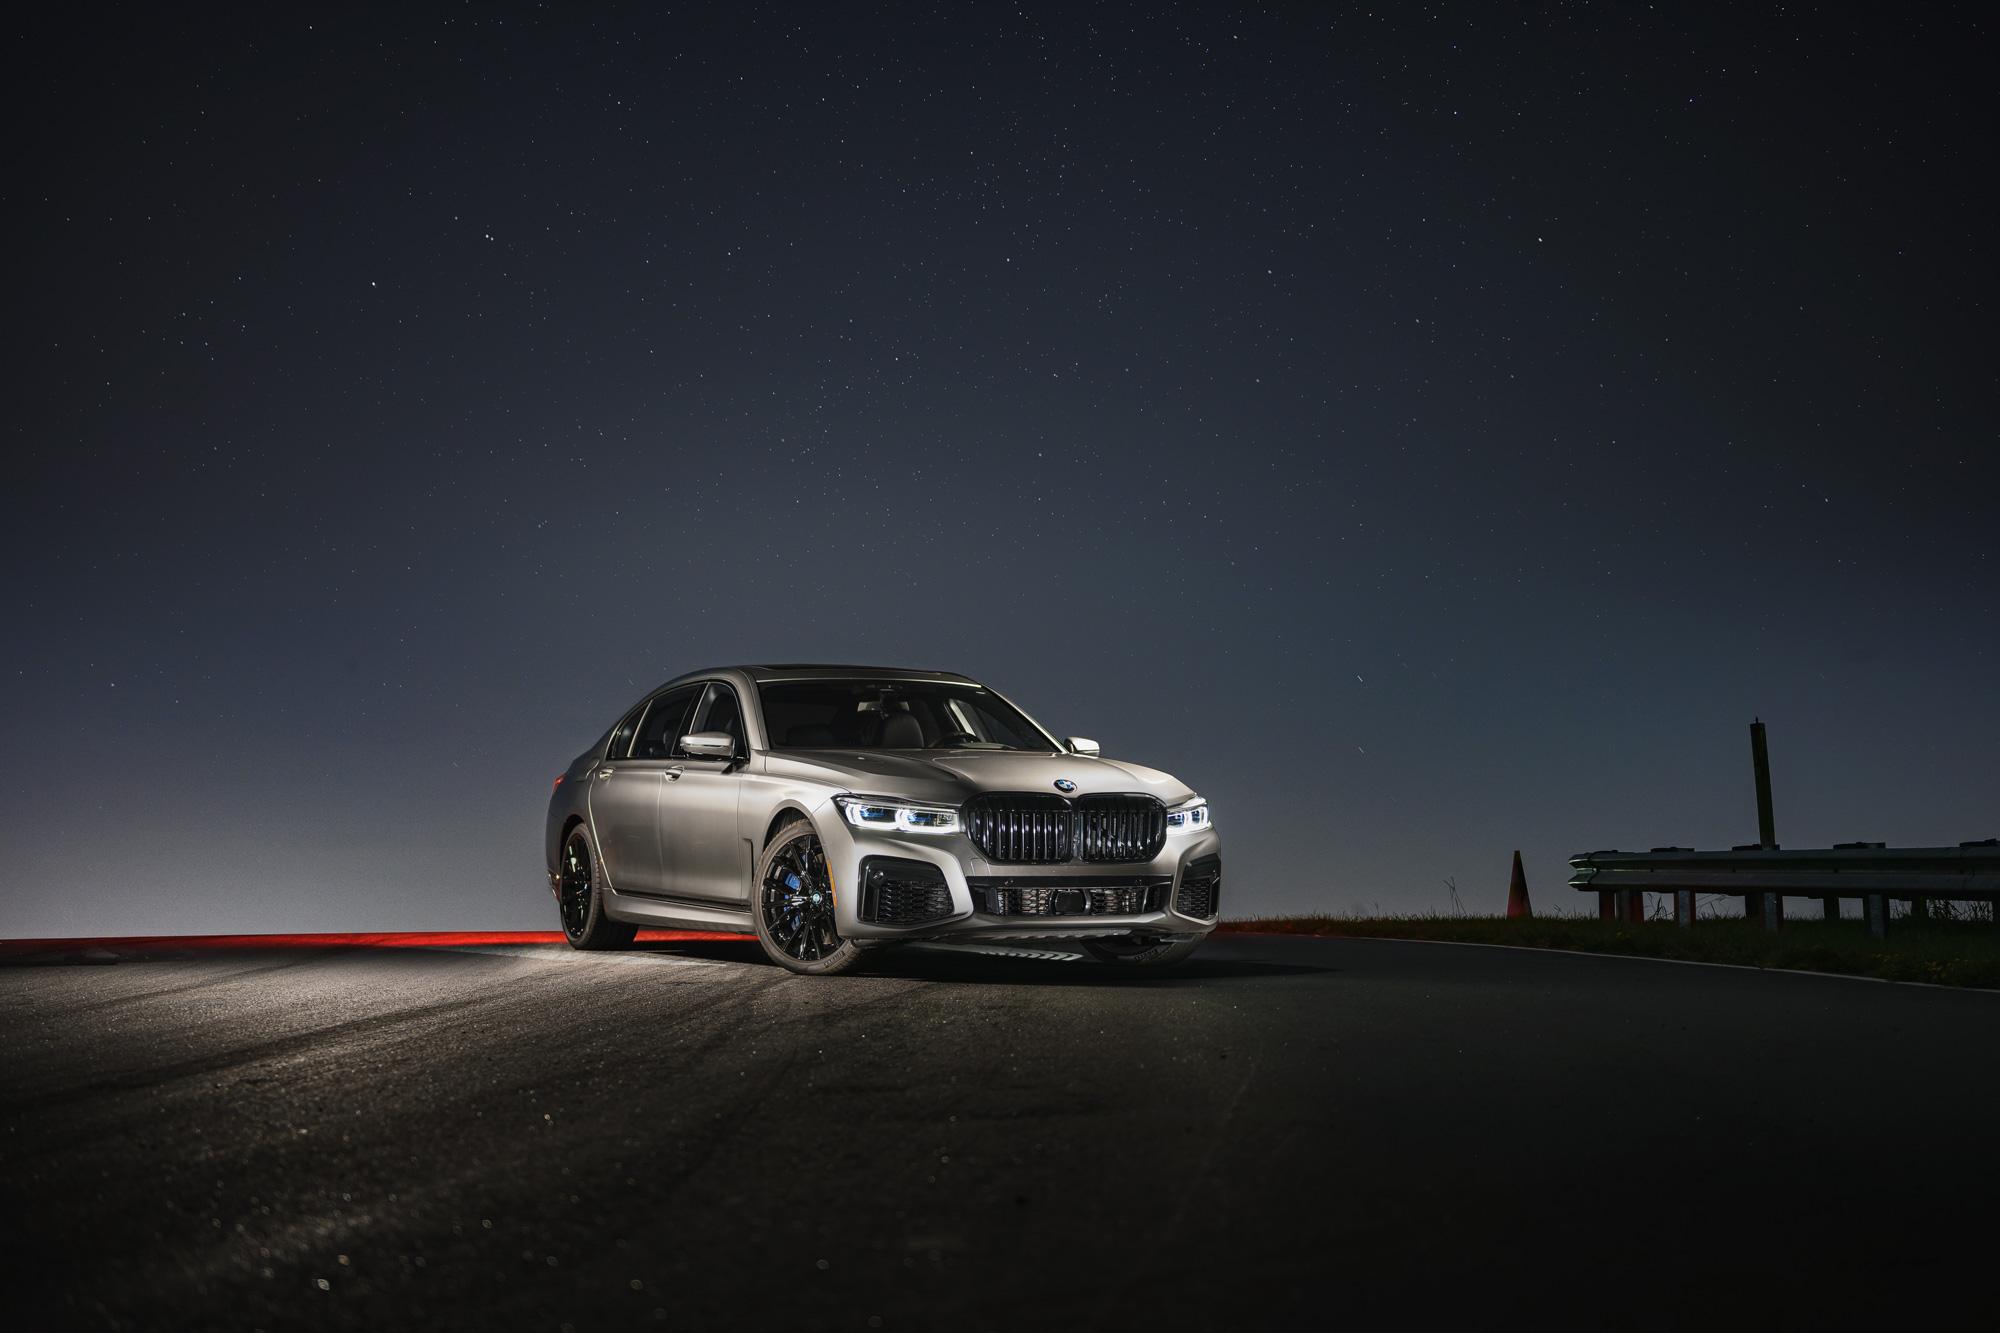 BMW M760i stars